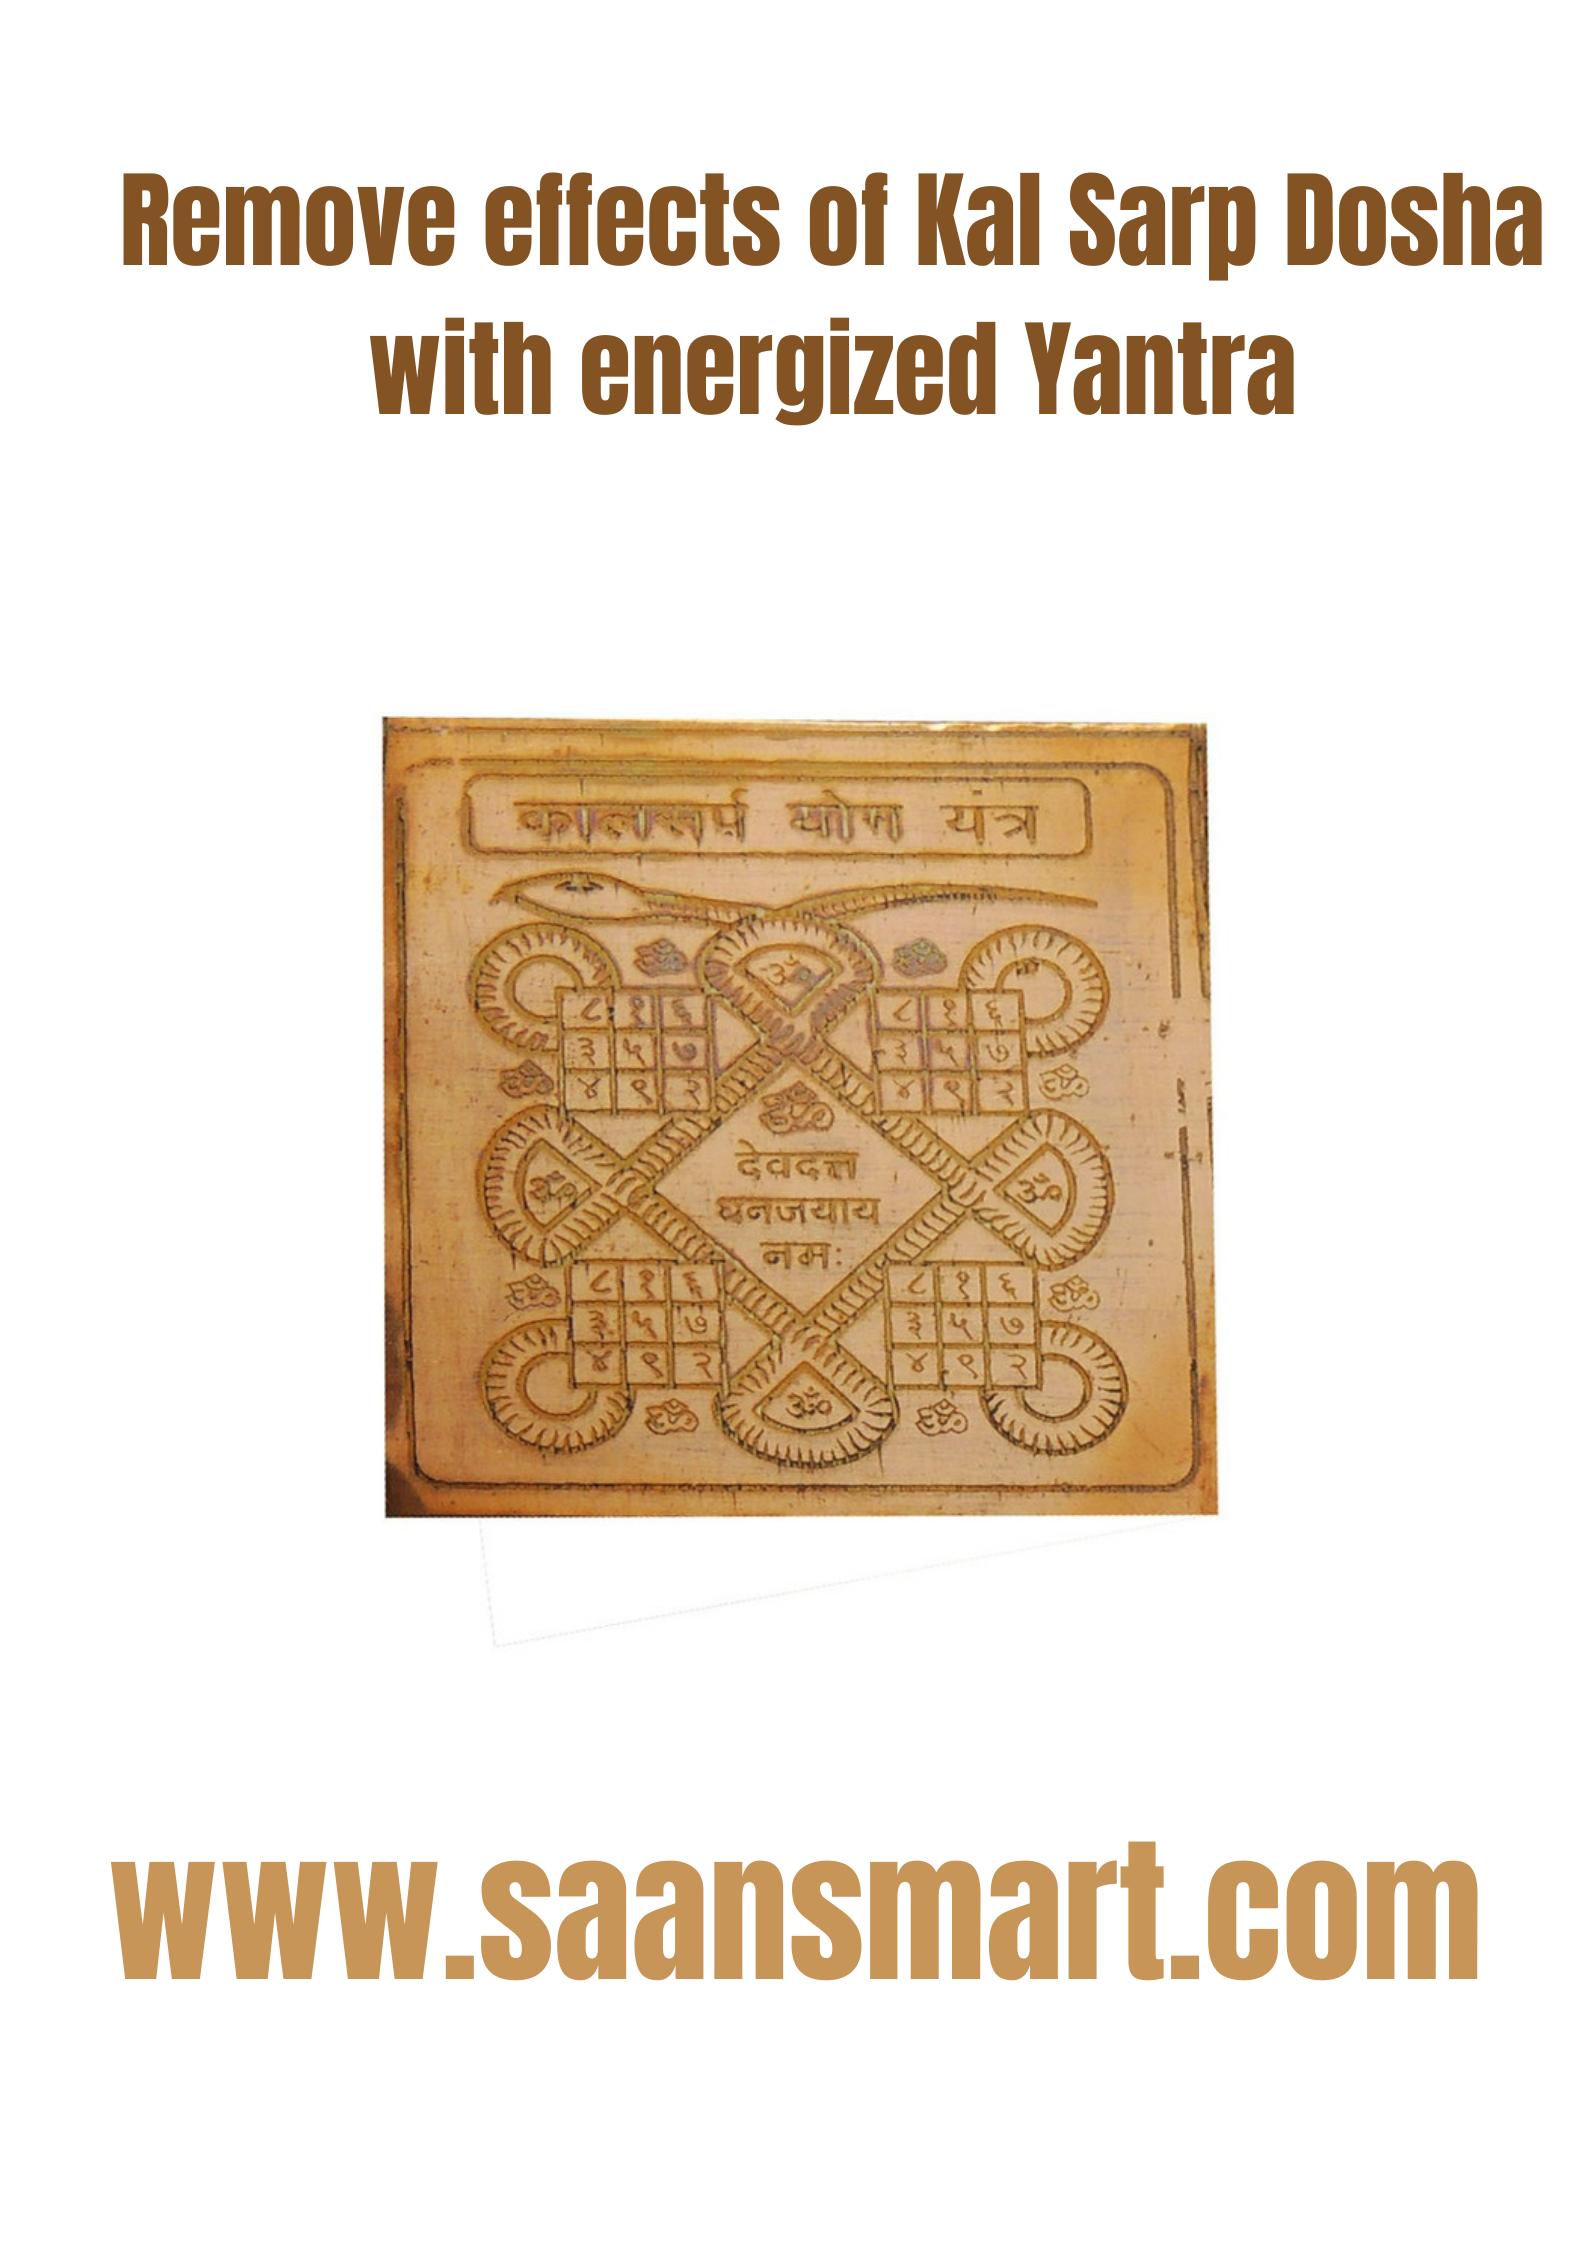 Kaal Sarp Dosh: A Powerful Yantra Remedy